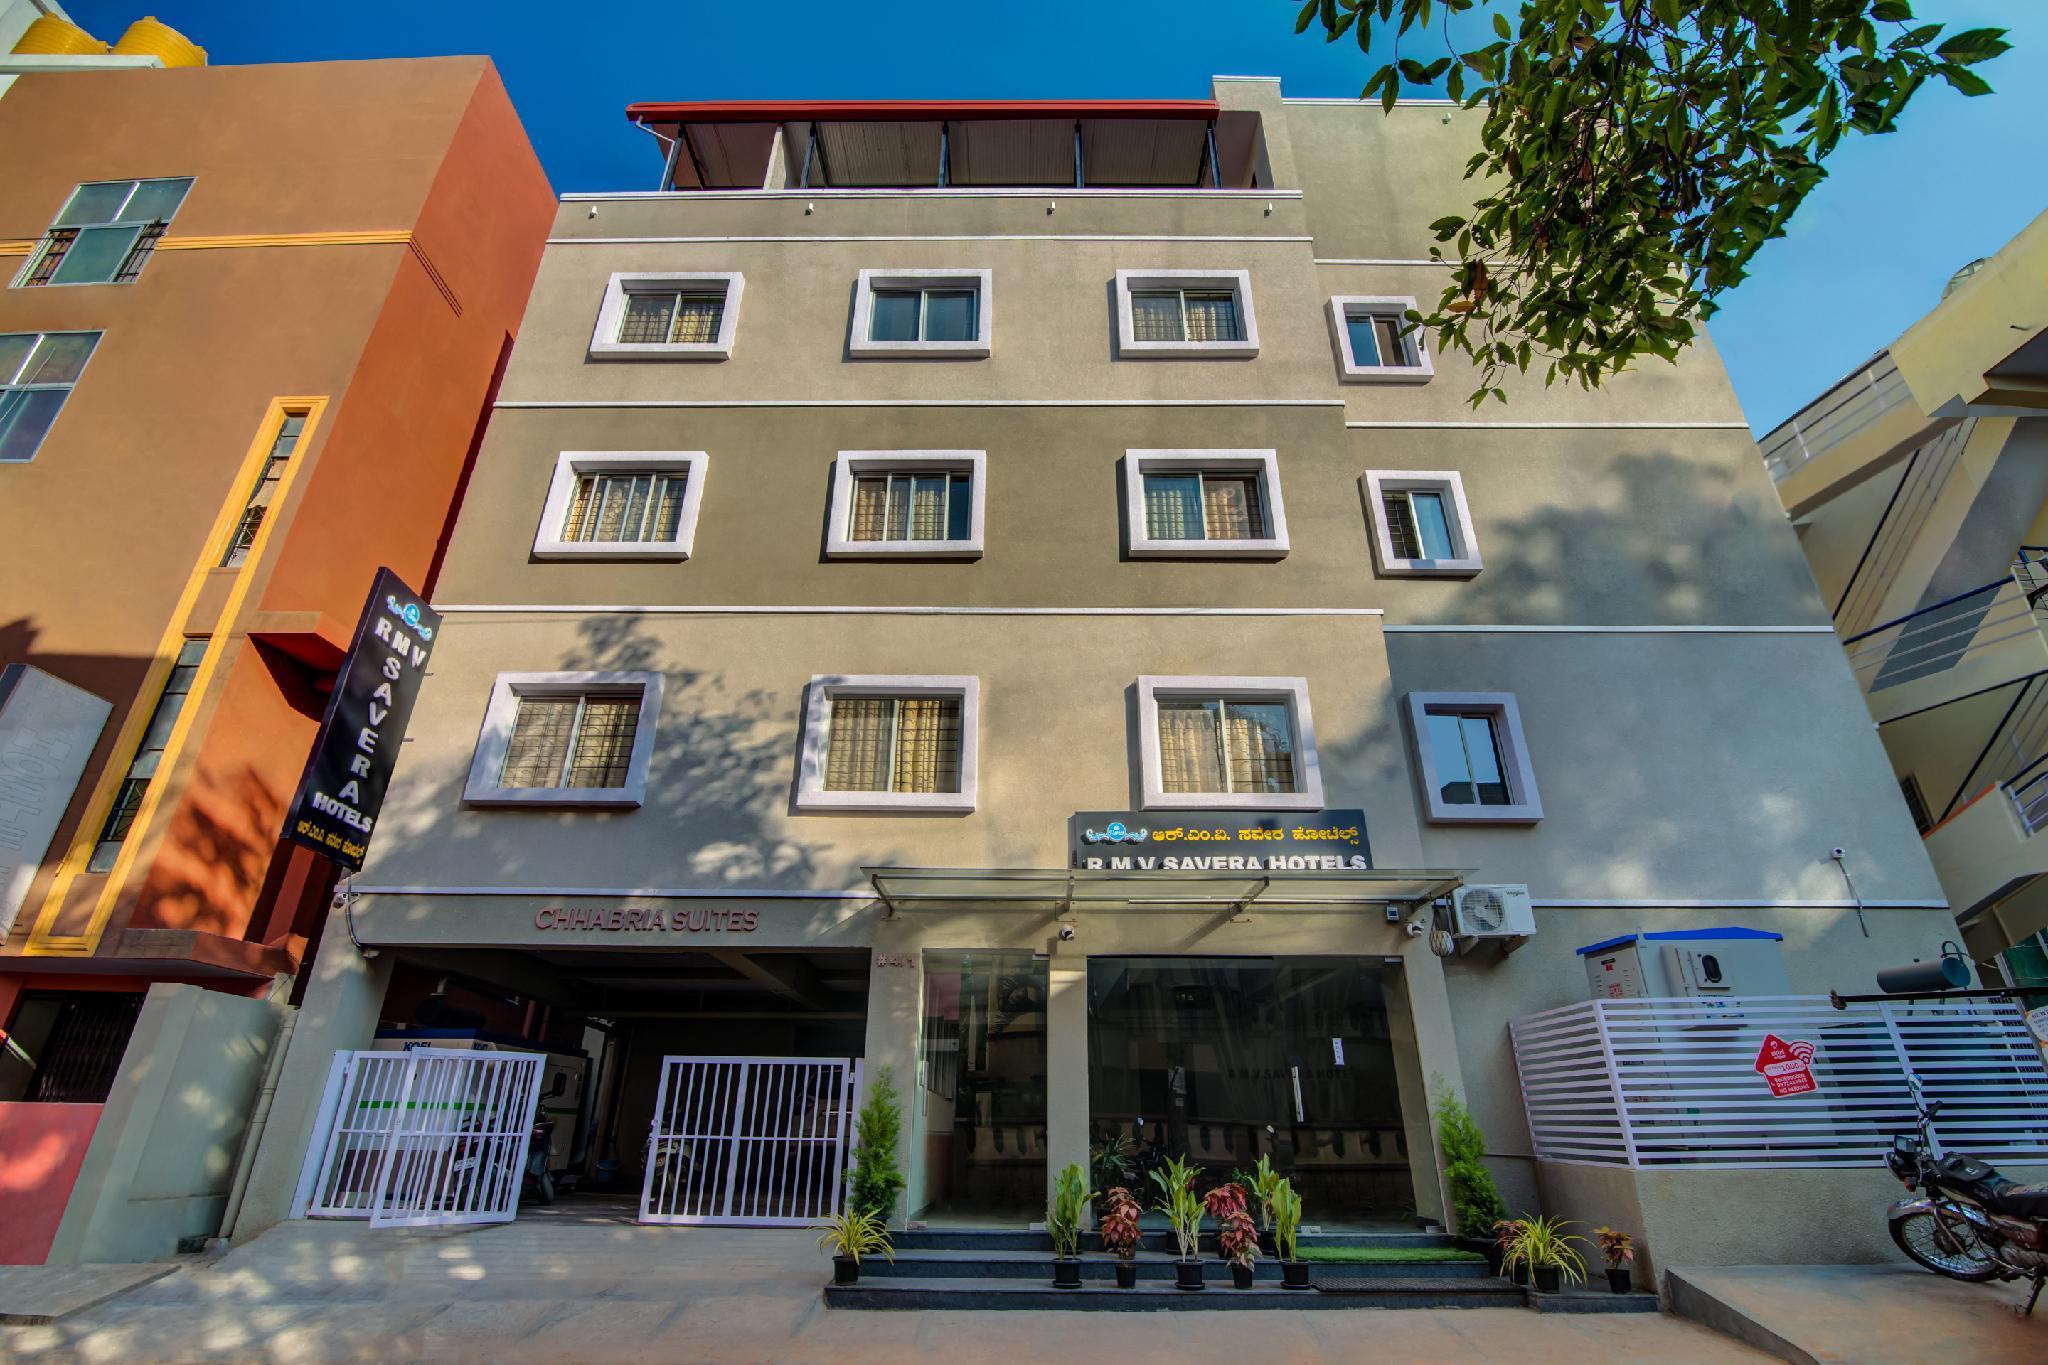 Capital O 23481 Rmv Savera Hotels